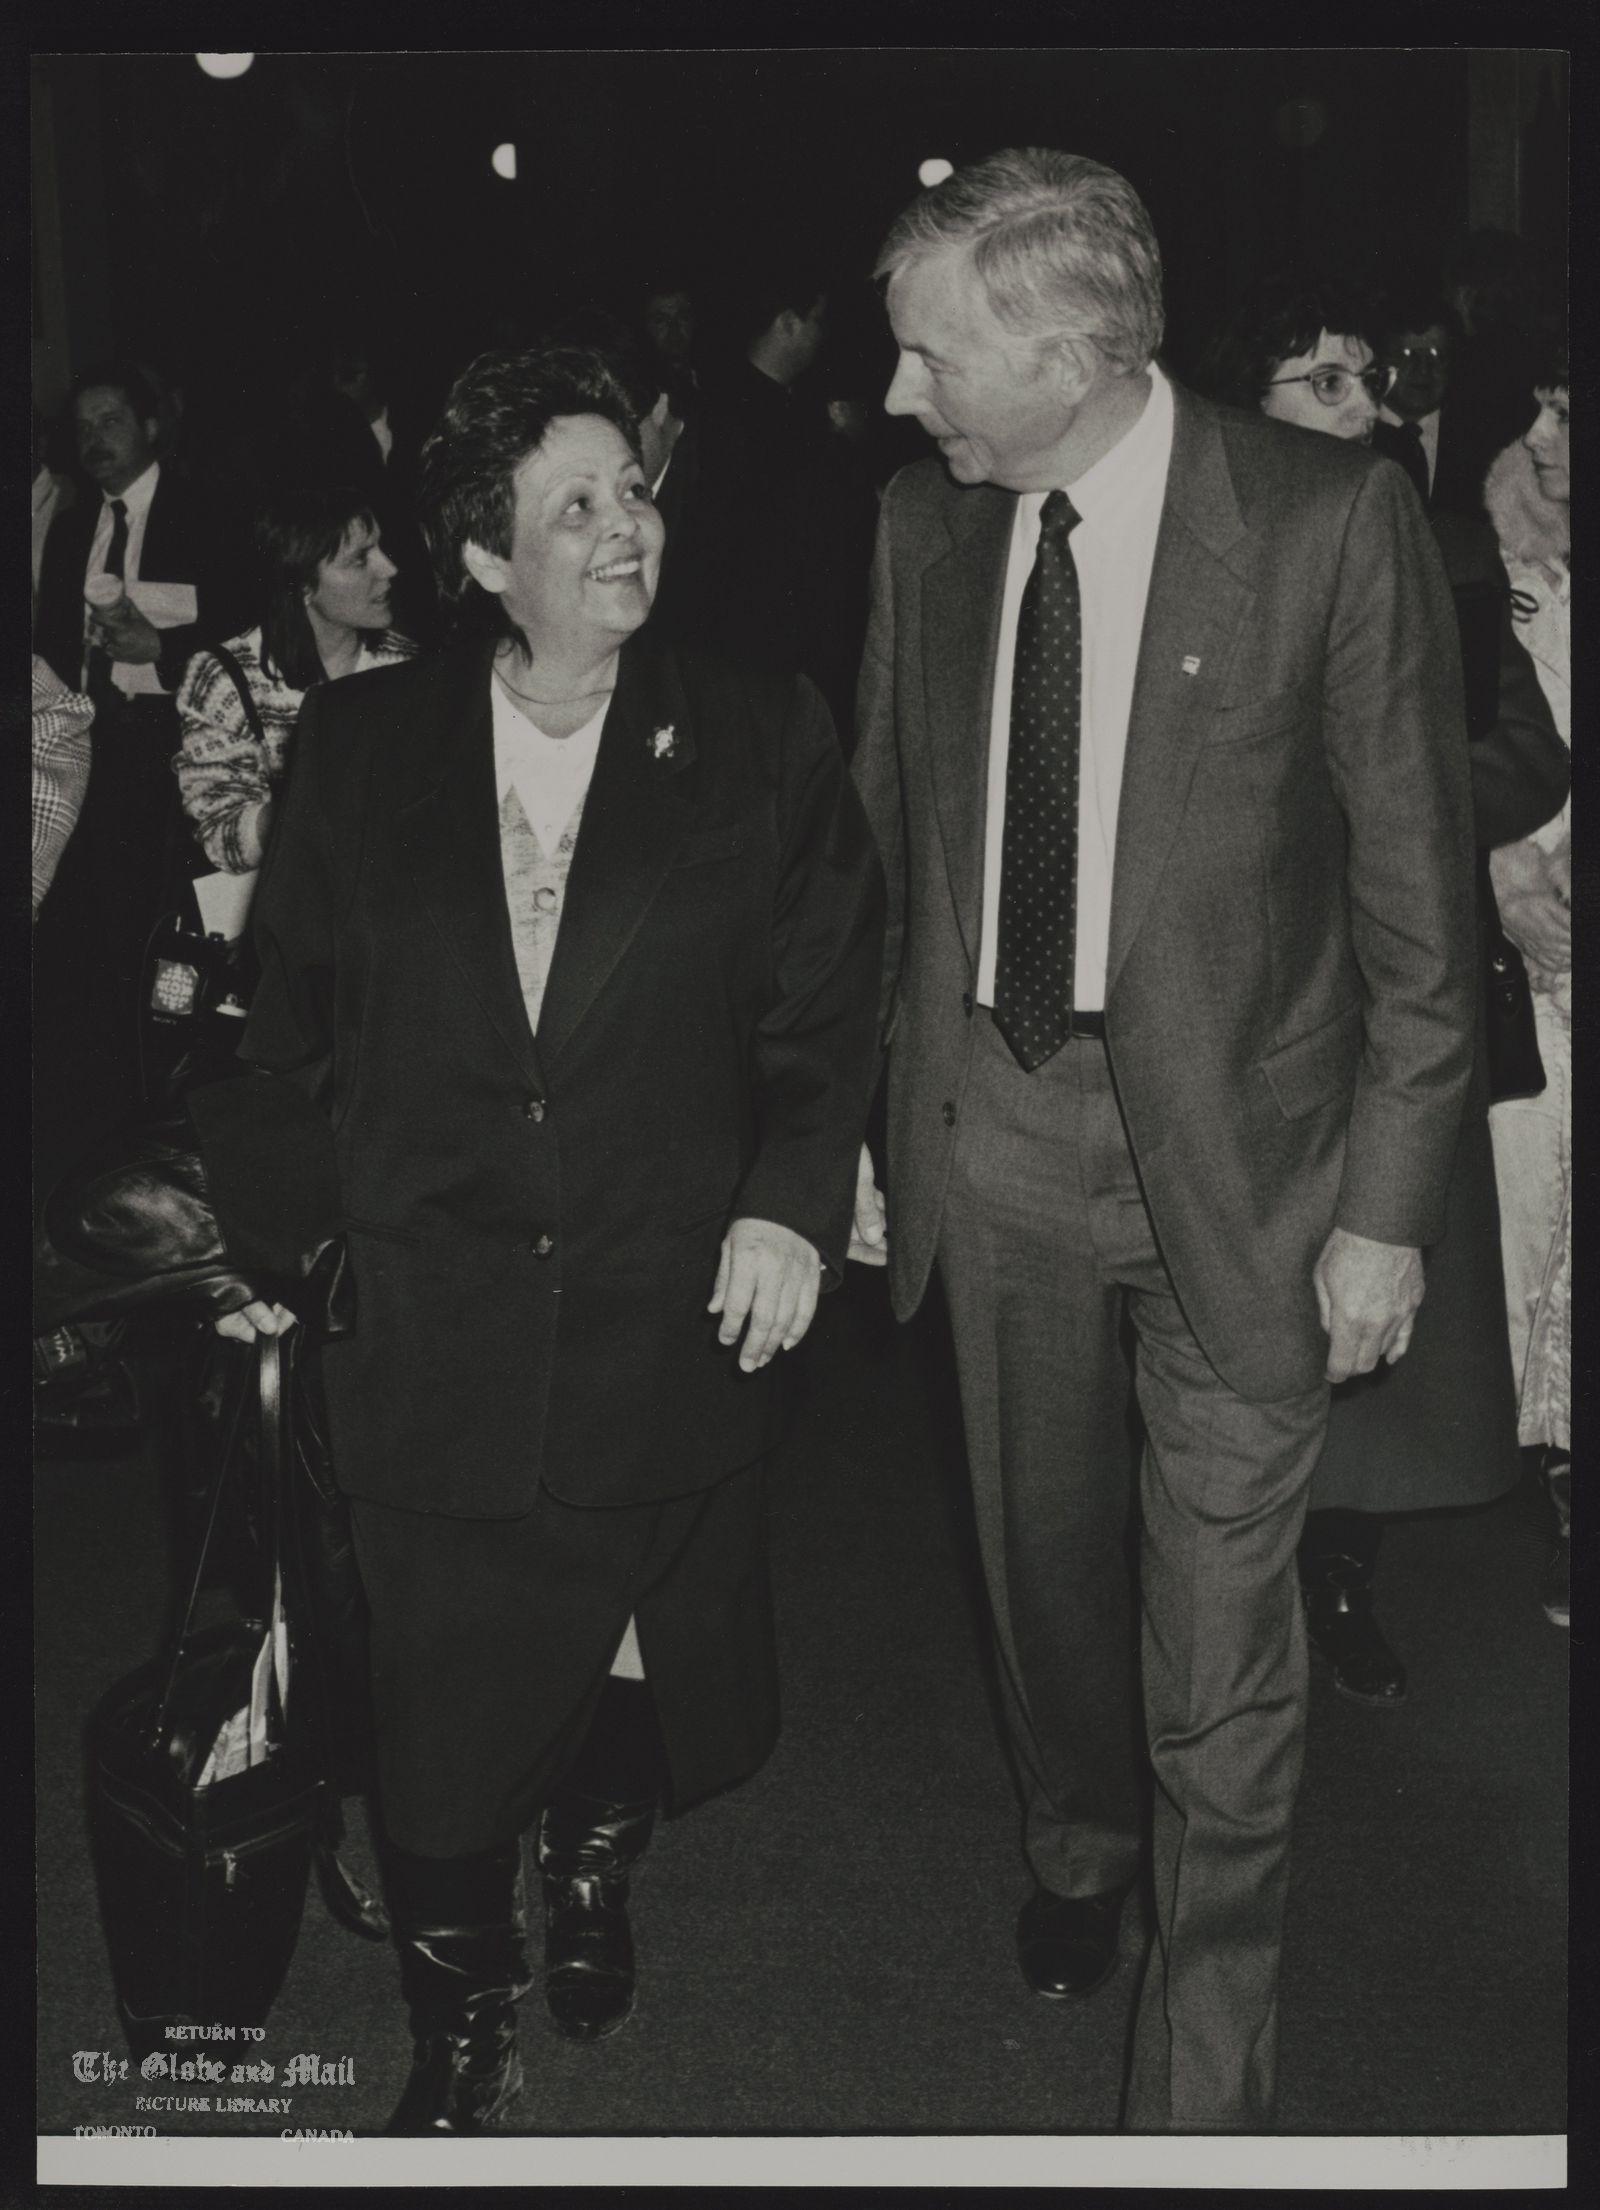 NATIVE PEOPLE CANADA CHIPPEWA CHIEF LORRAINE MCRAE OF RAMA AND WILLIAM SAUNDERSON, MINISTER OF ECONOMIC DEV. & TRADE.